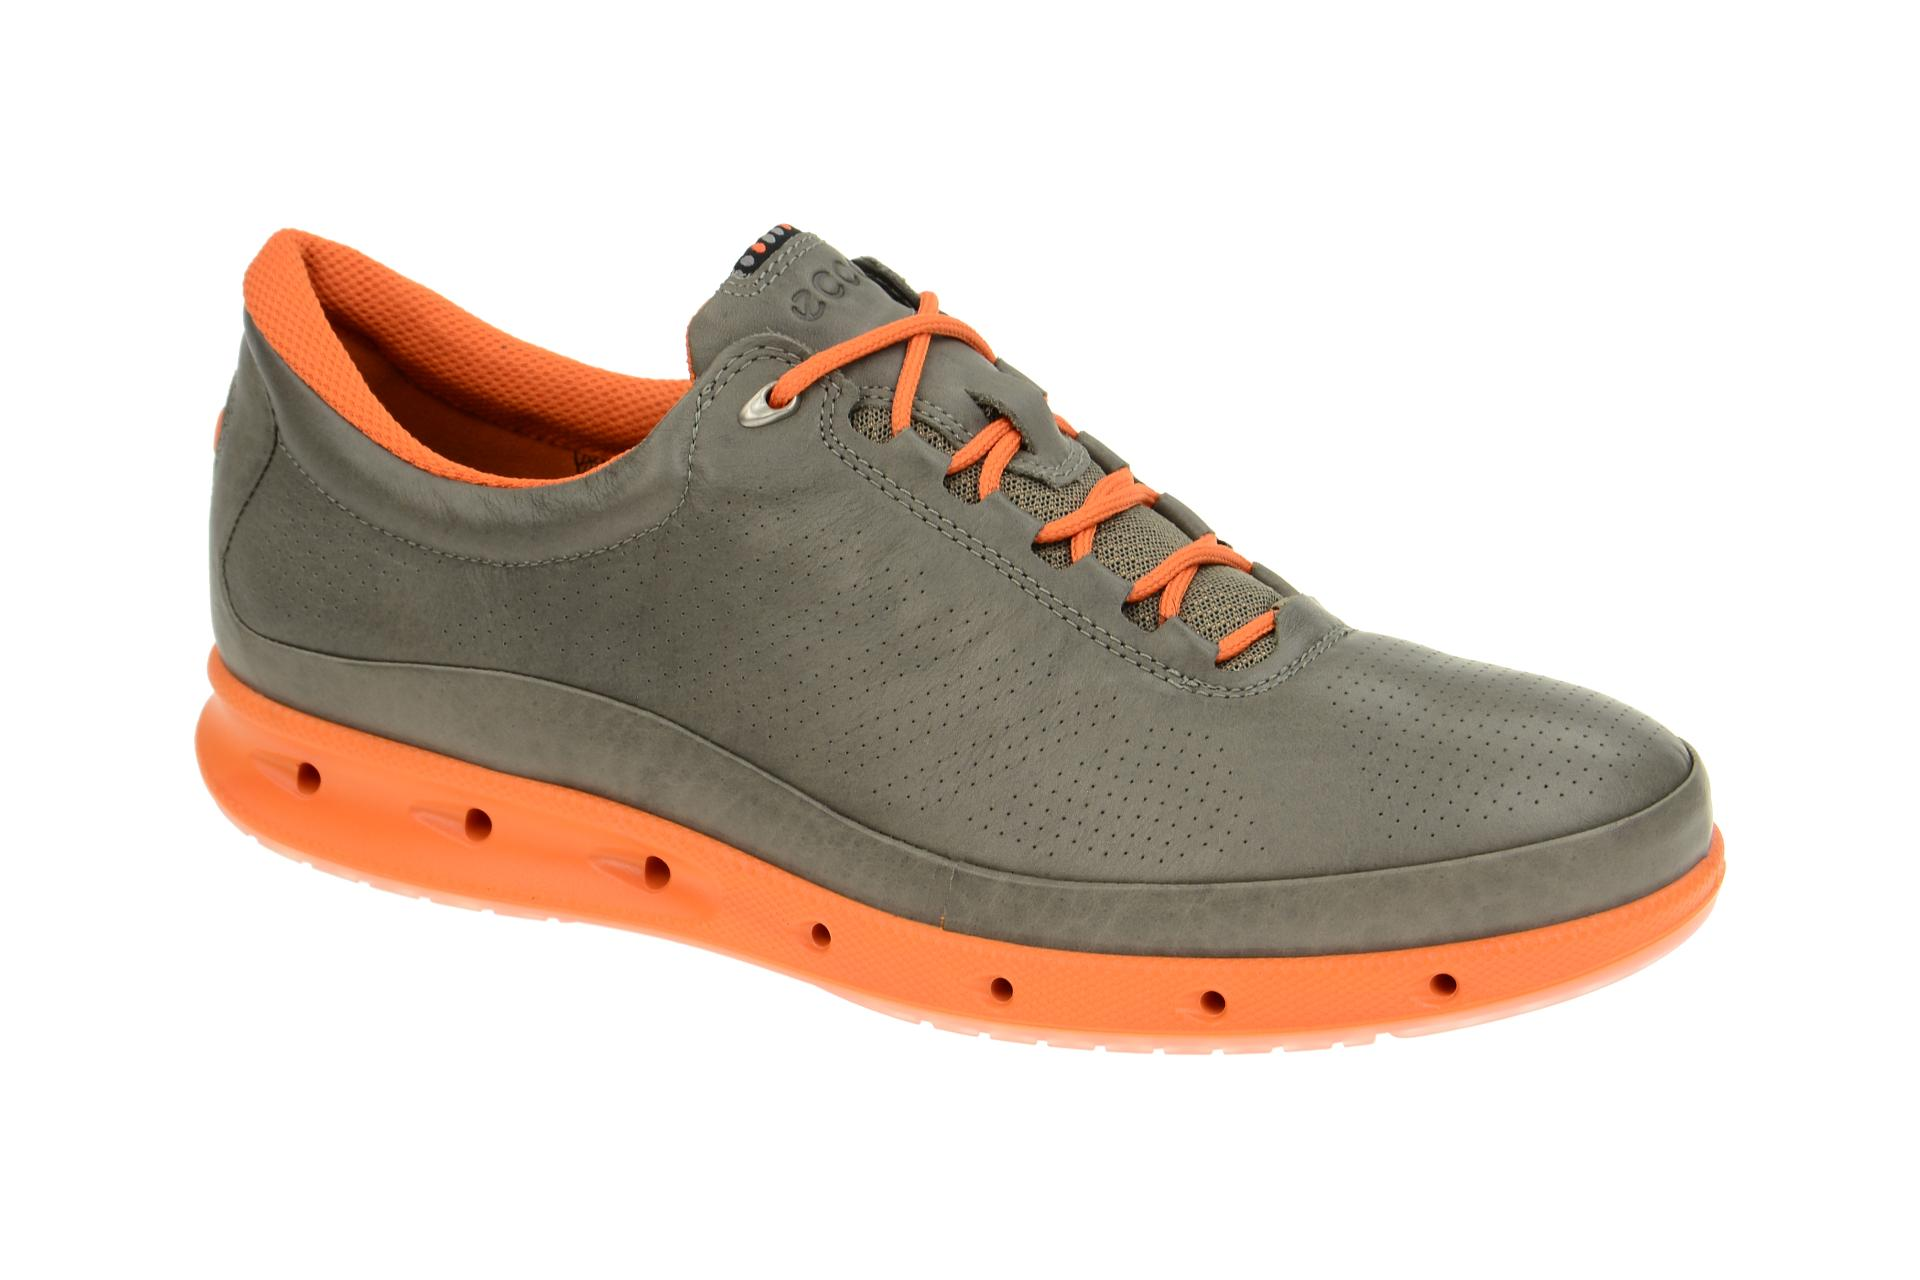 the best attitude c75e9 7e4b3 Ecco Cool Schuhe grau orange - 83130459556